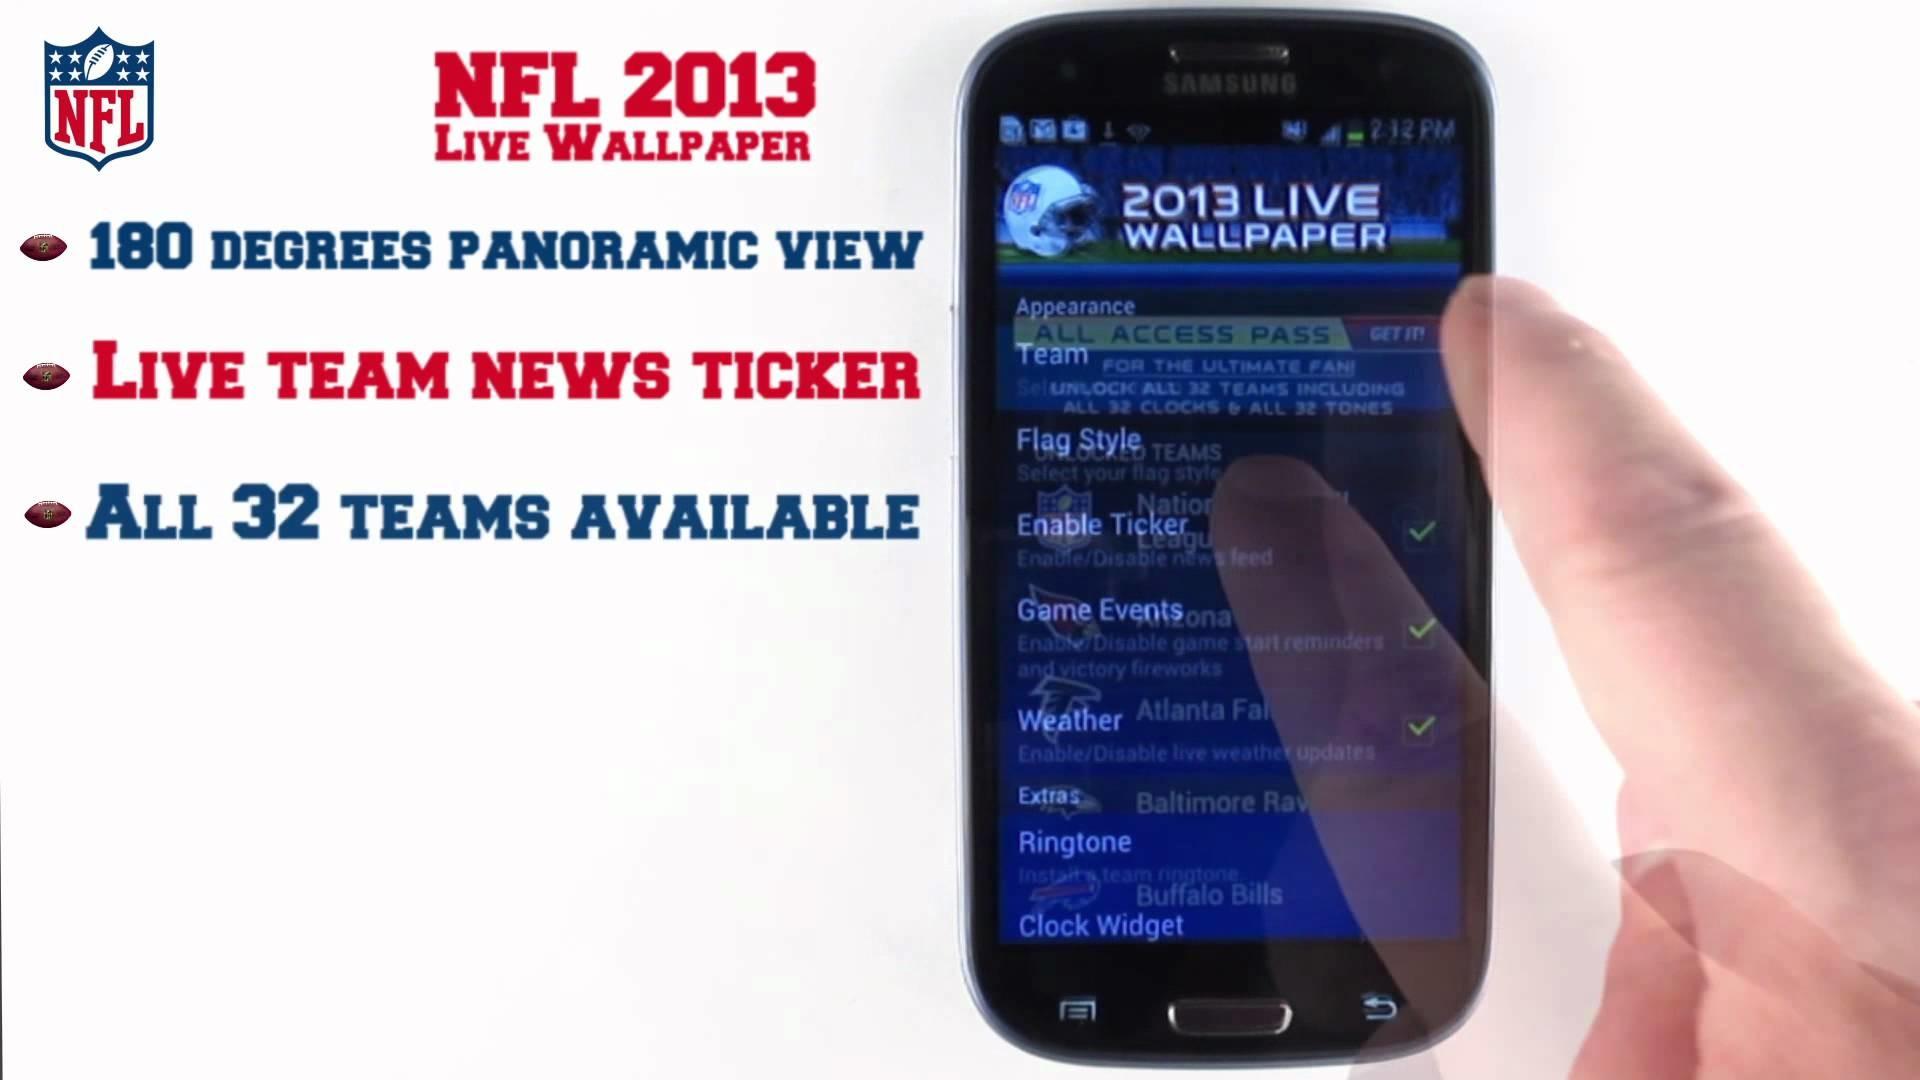 NFL 2013 Live Wallpaper